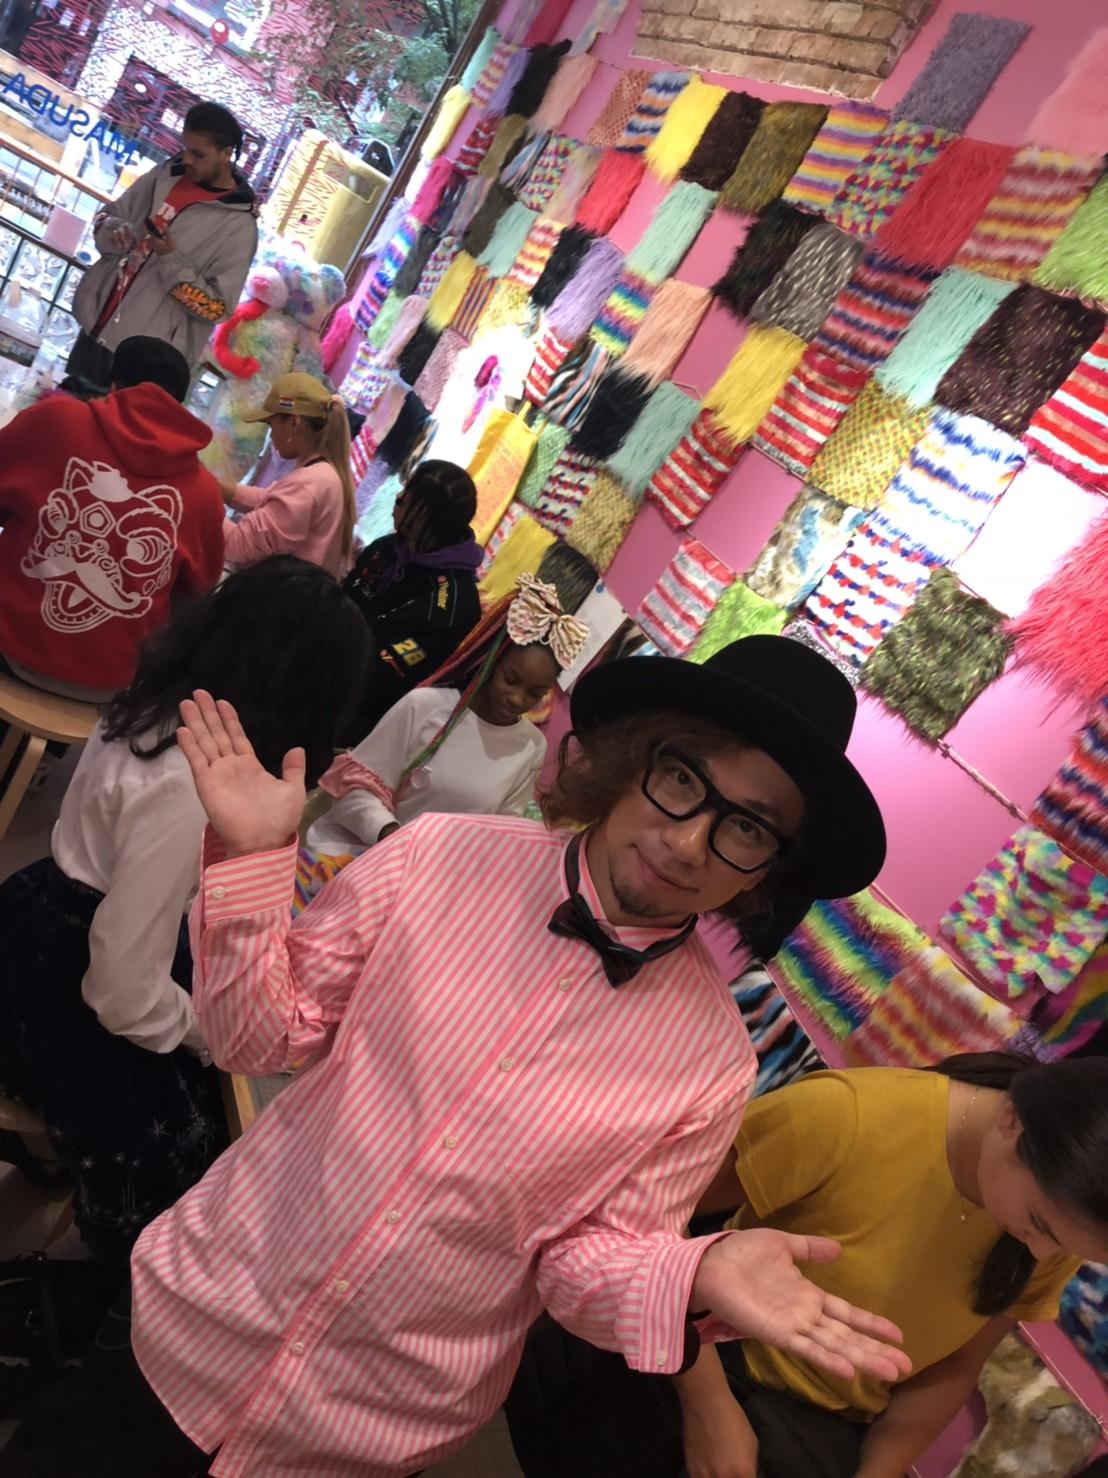 Sebastian Masuda met kleurrijk hemd, zwarte hoed en zwarte strik